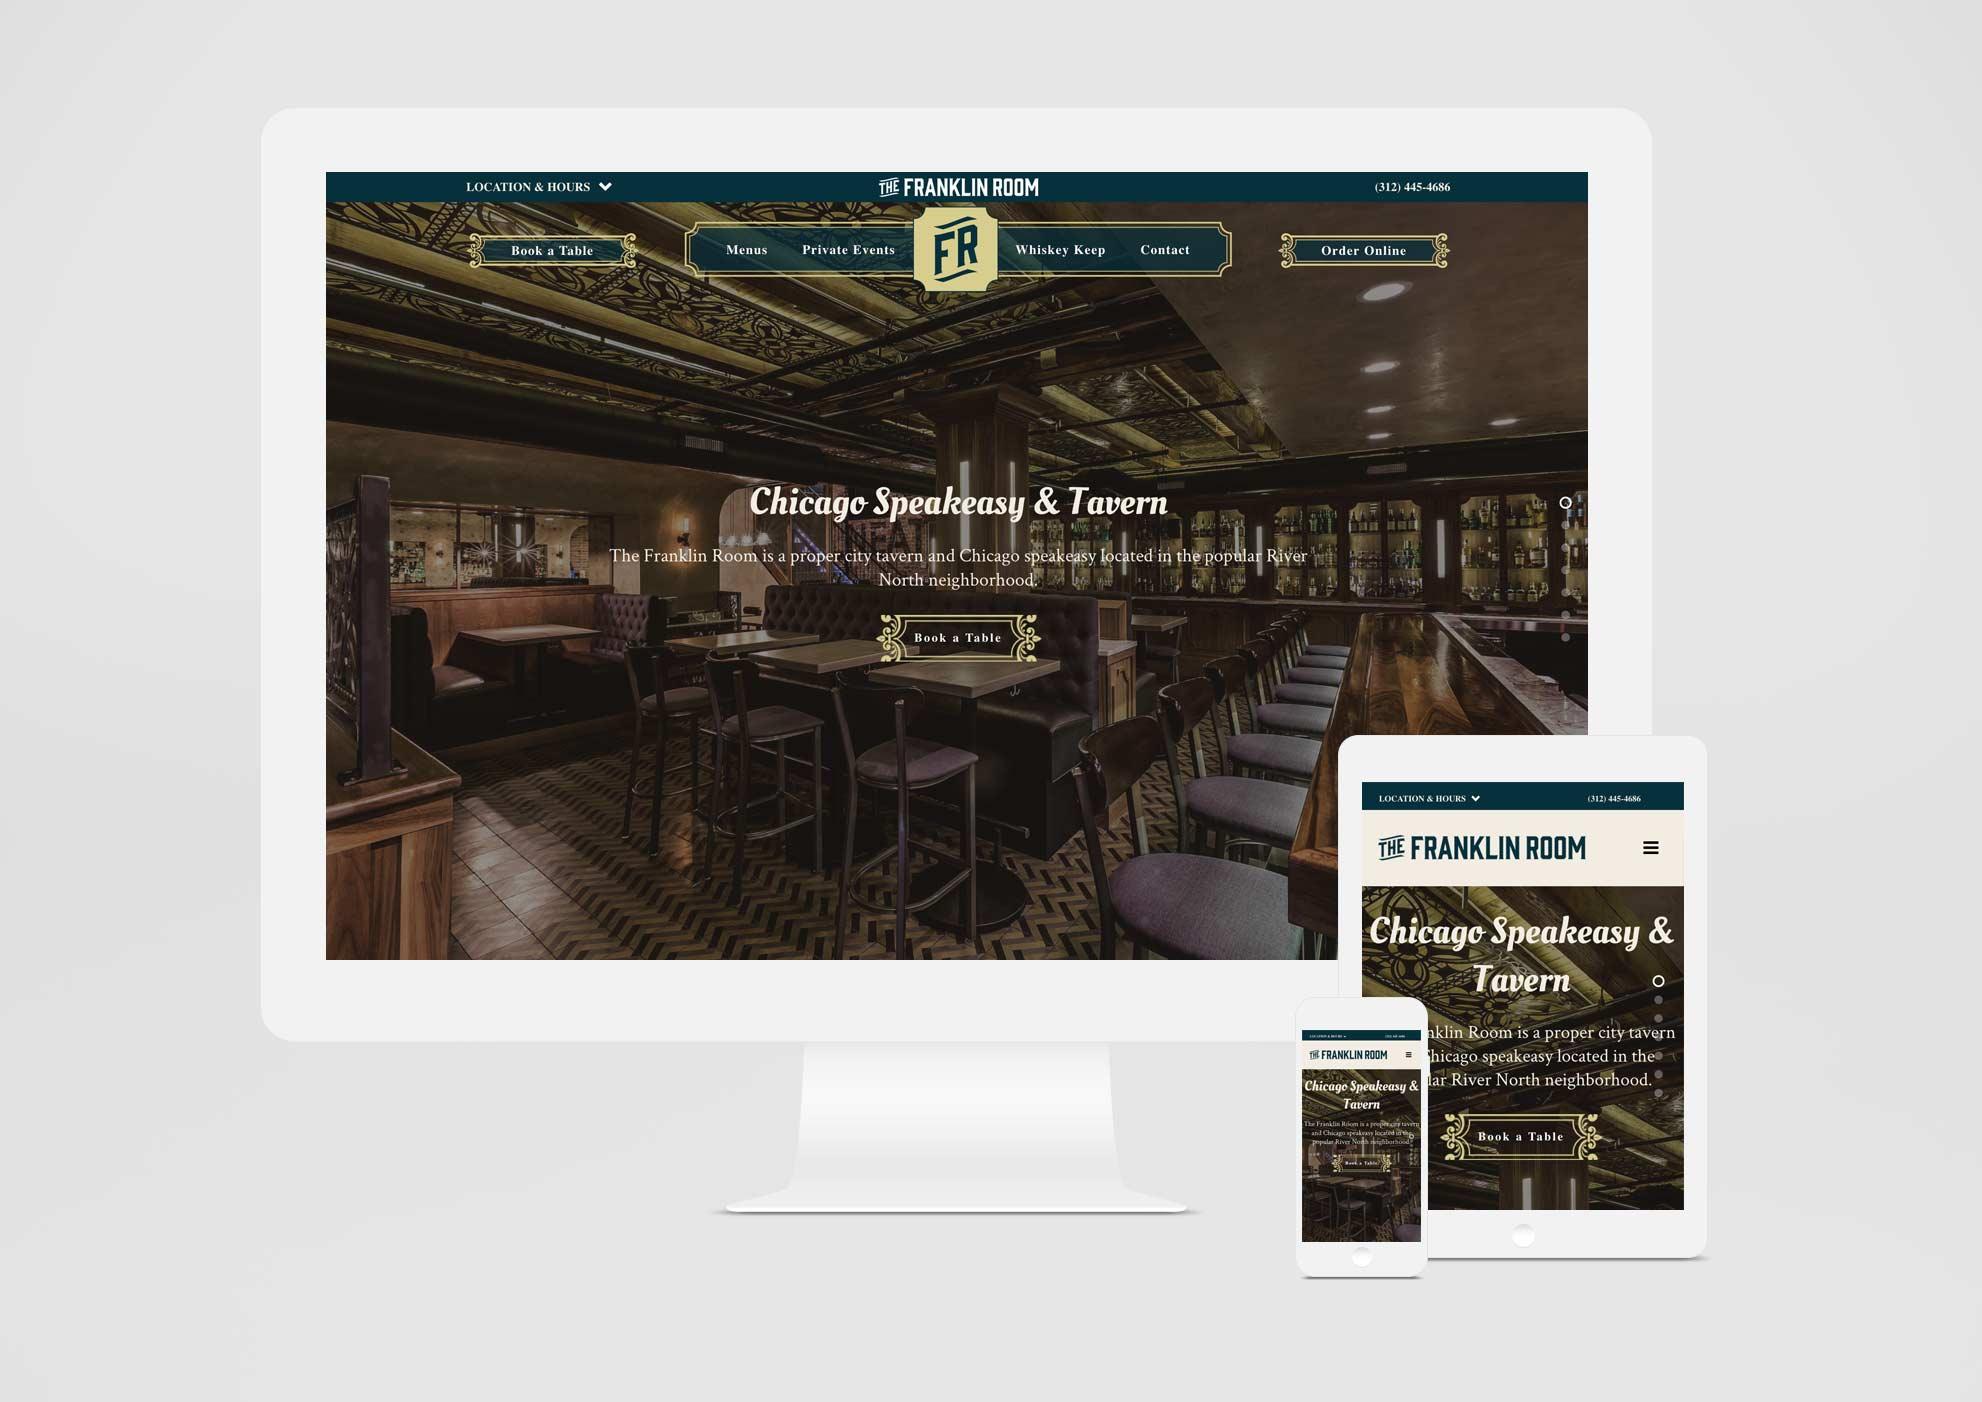 The Franklin Room – John Ryan Design